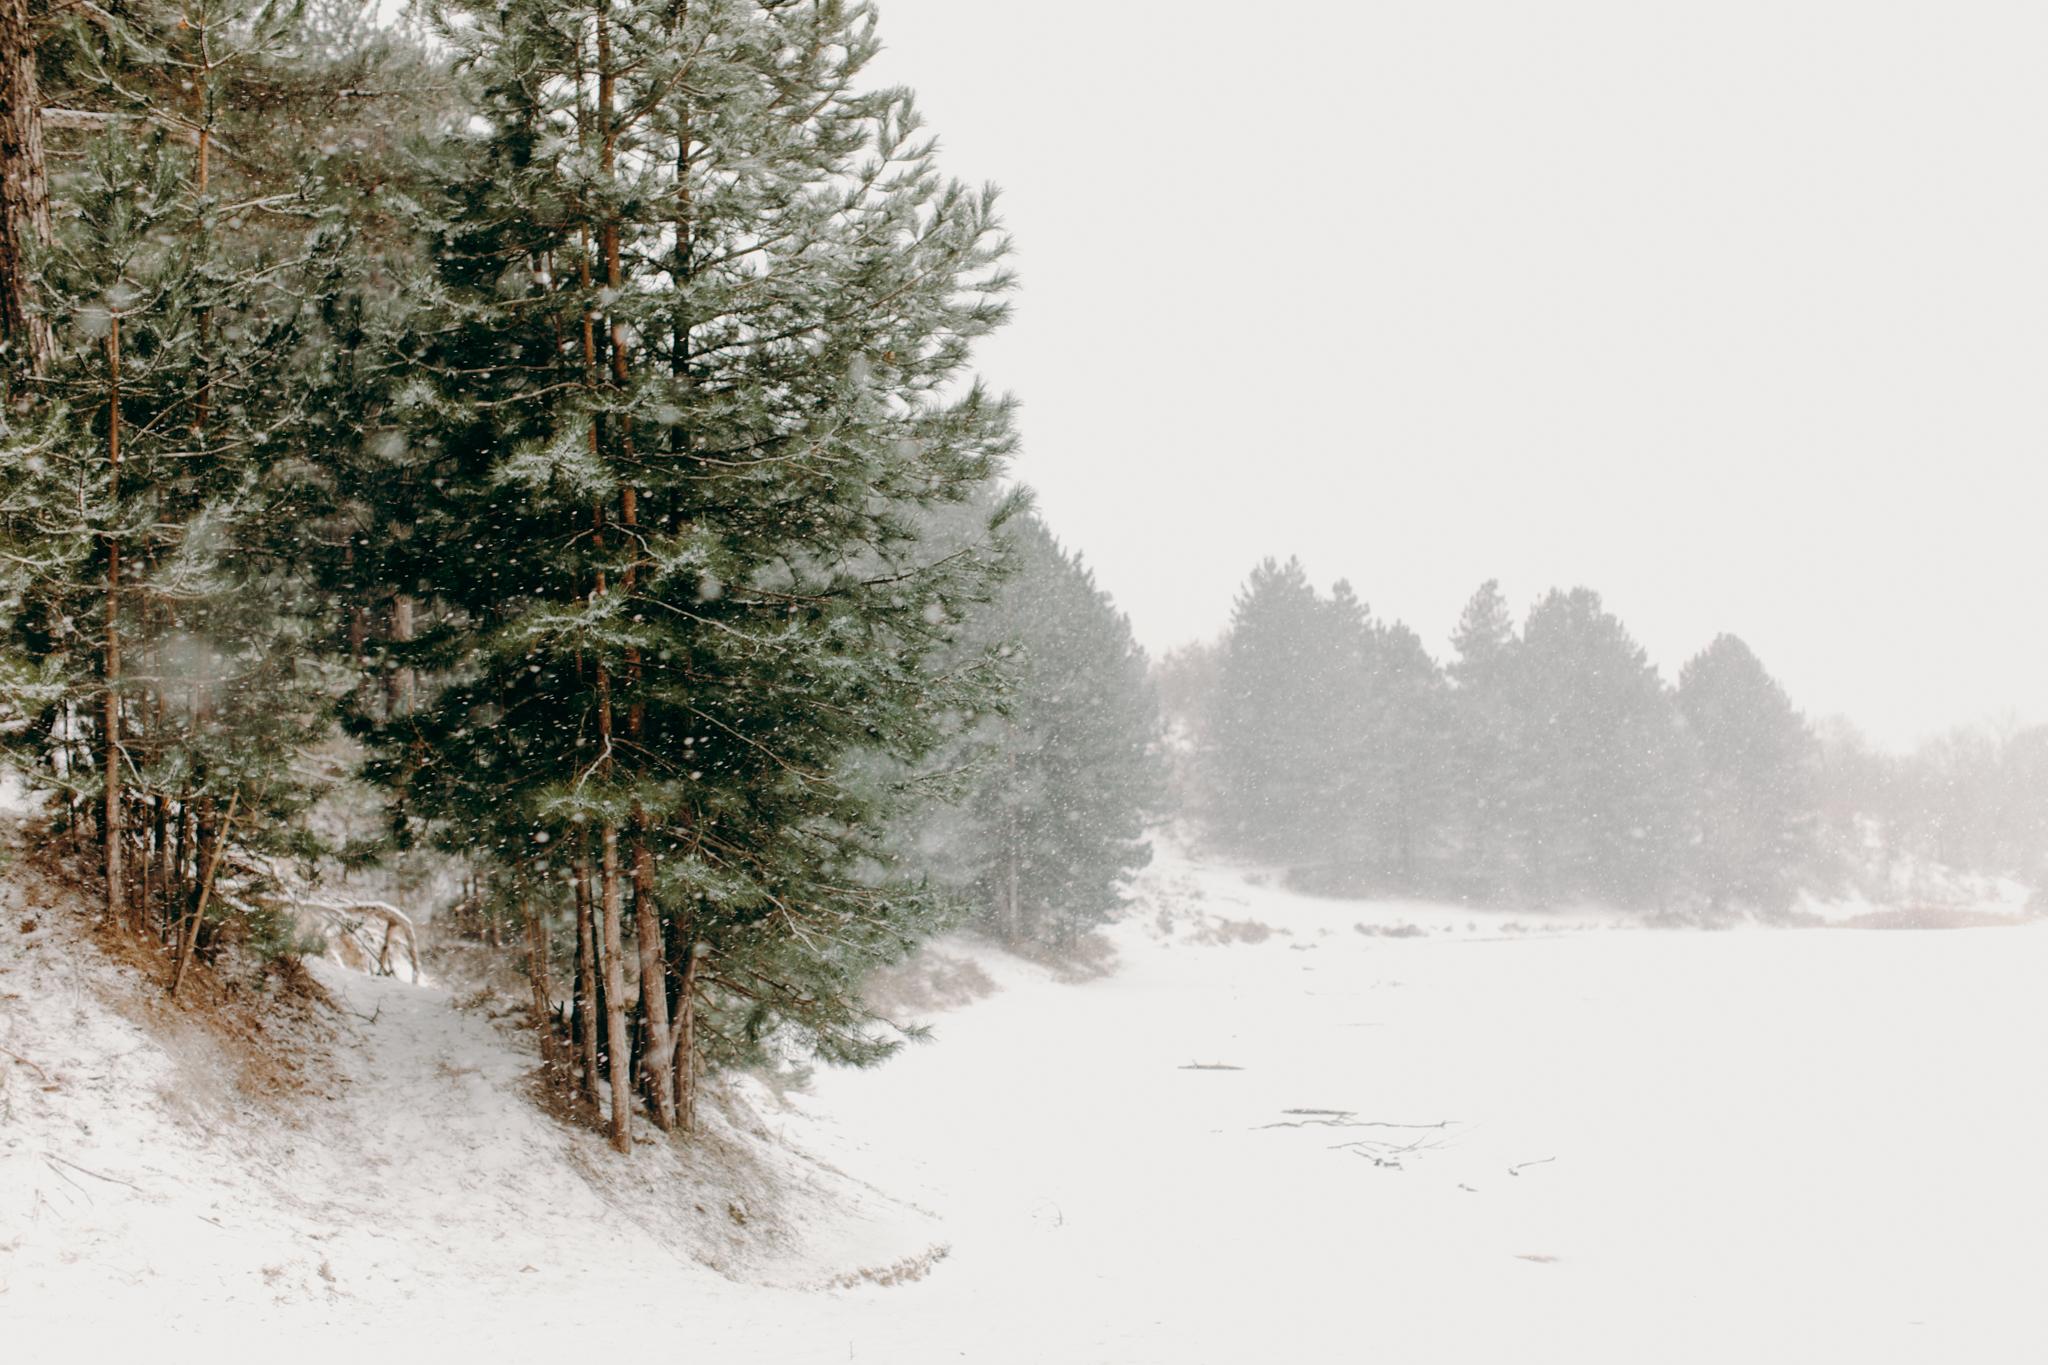 037-winter-sneeuw-oosterplas-bloemendaal.jpg